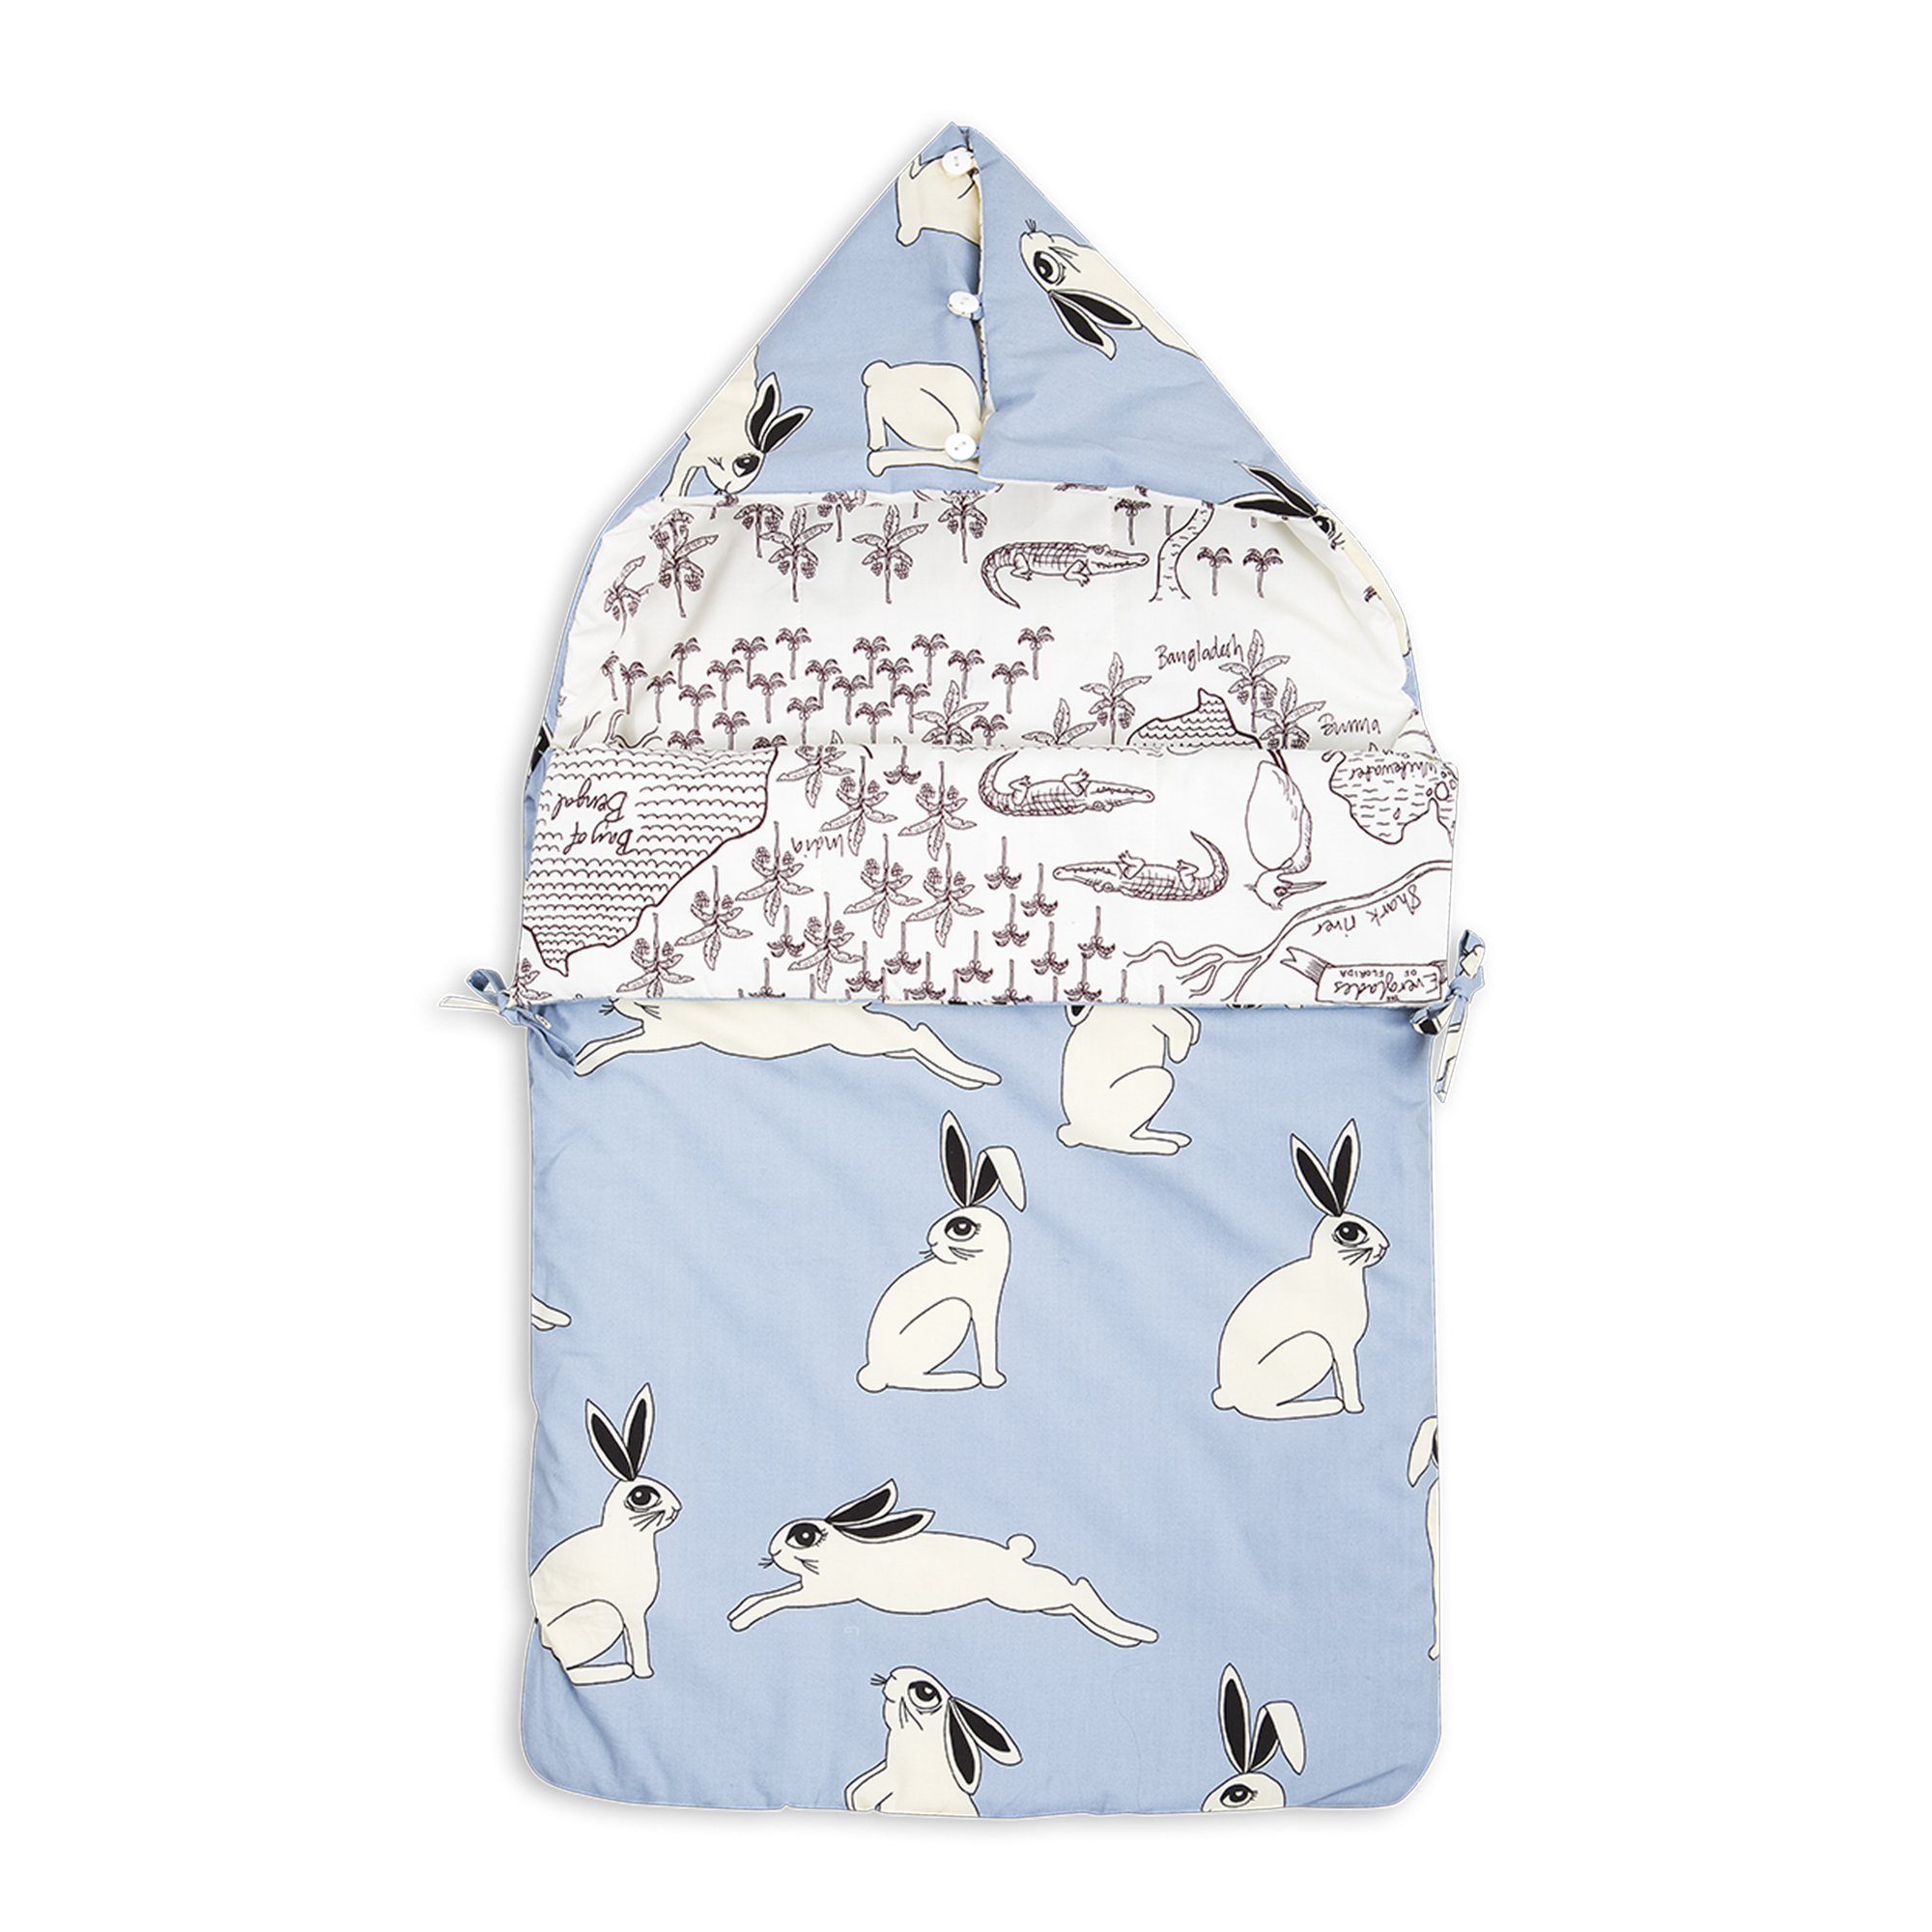 Rabbit Croco Map Sleeping Nest Sovp 229 Se Mini Rodini Home